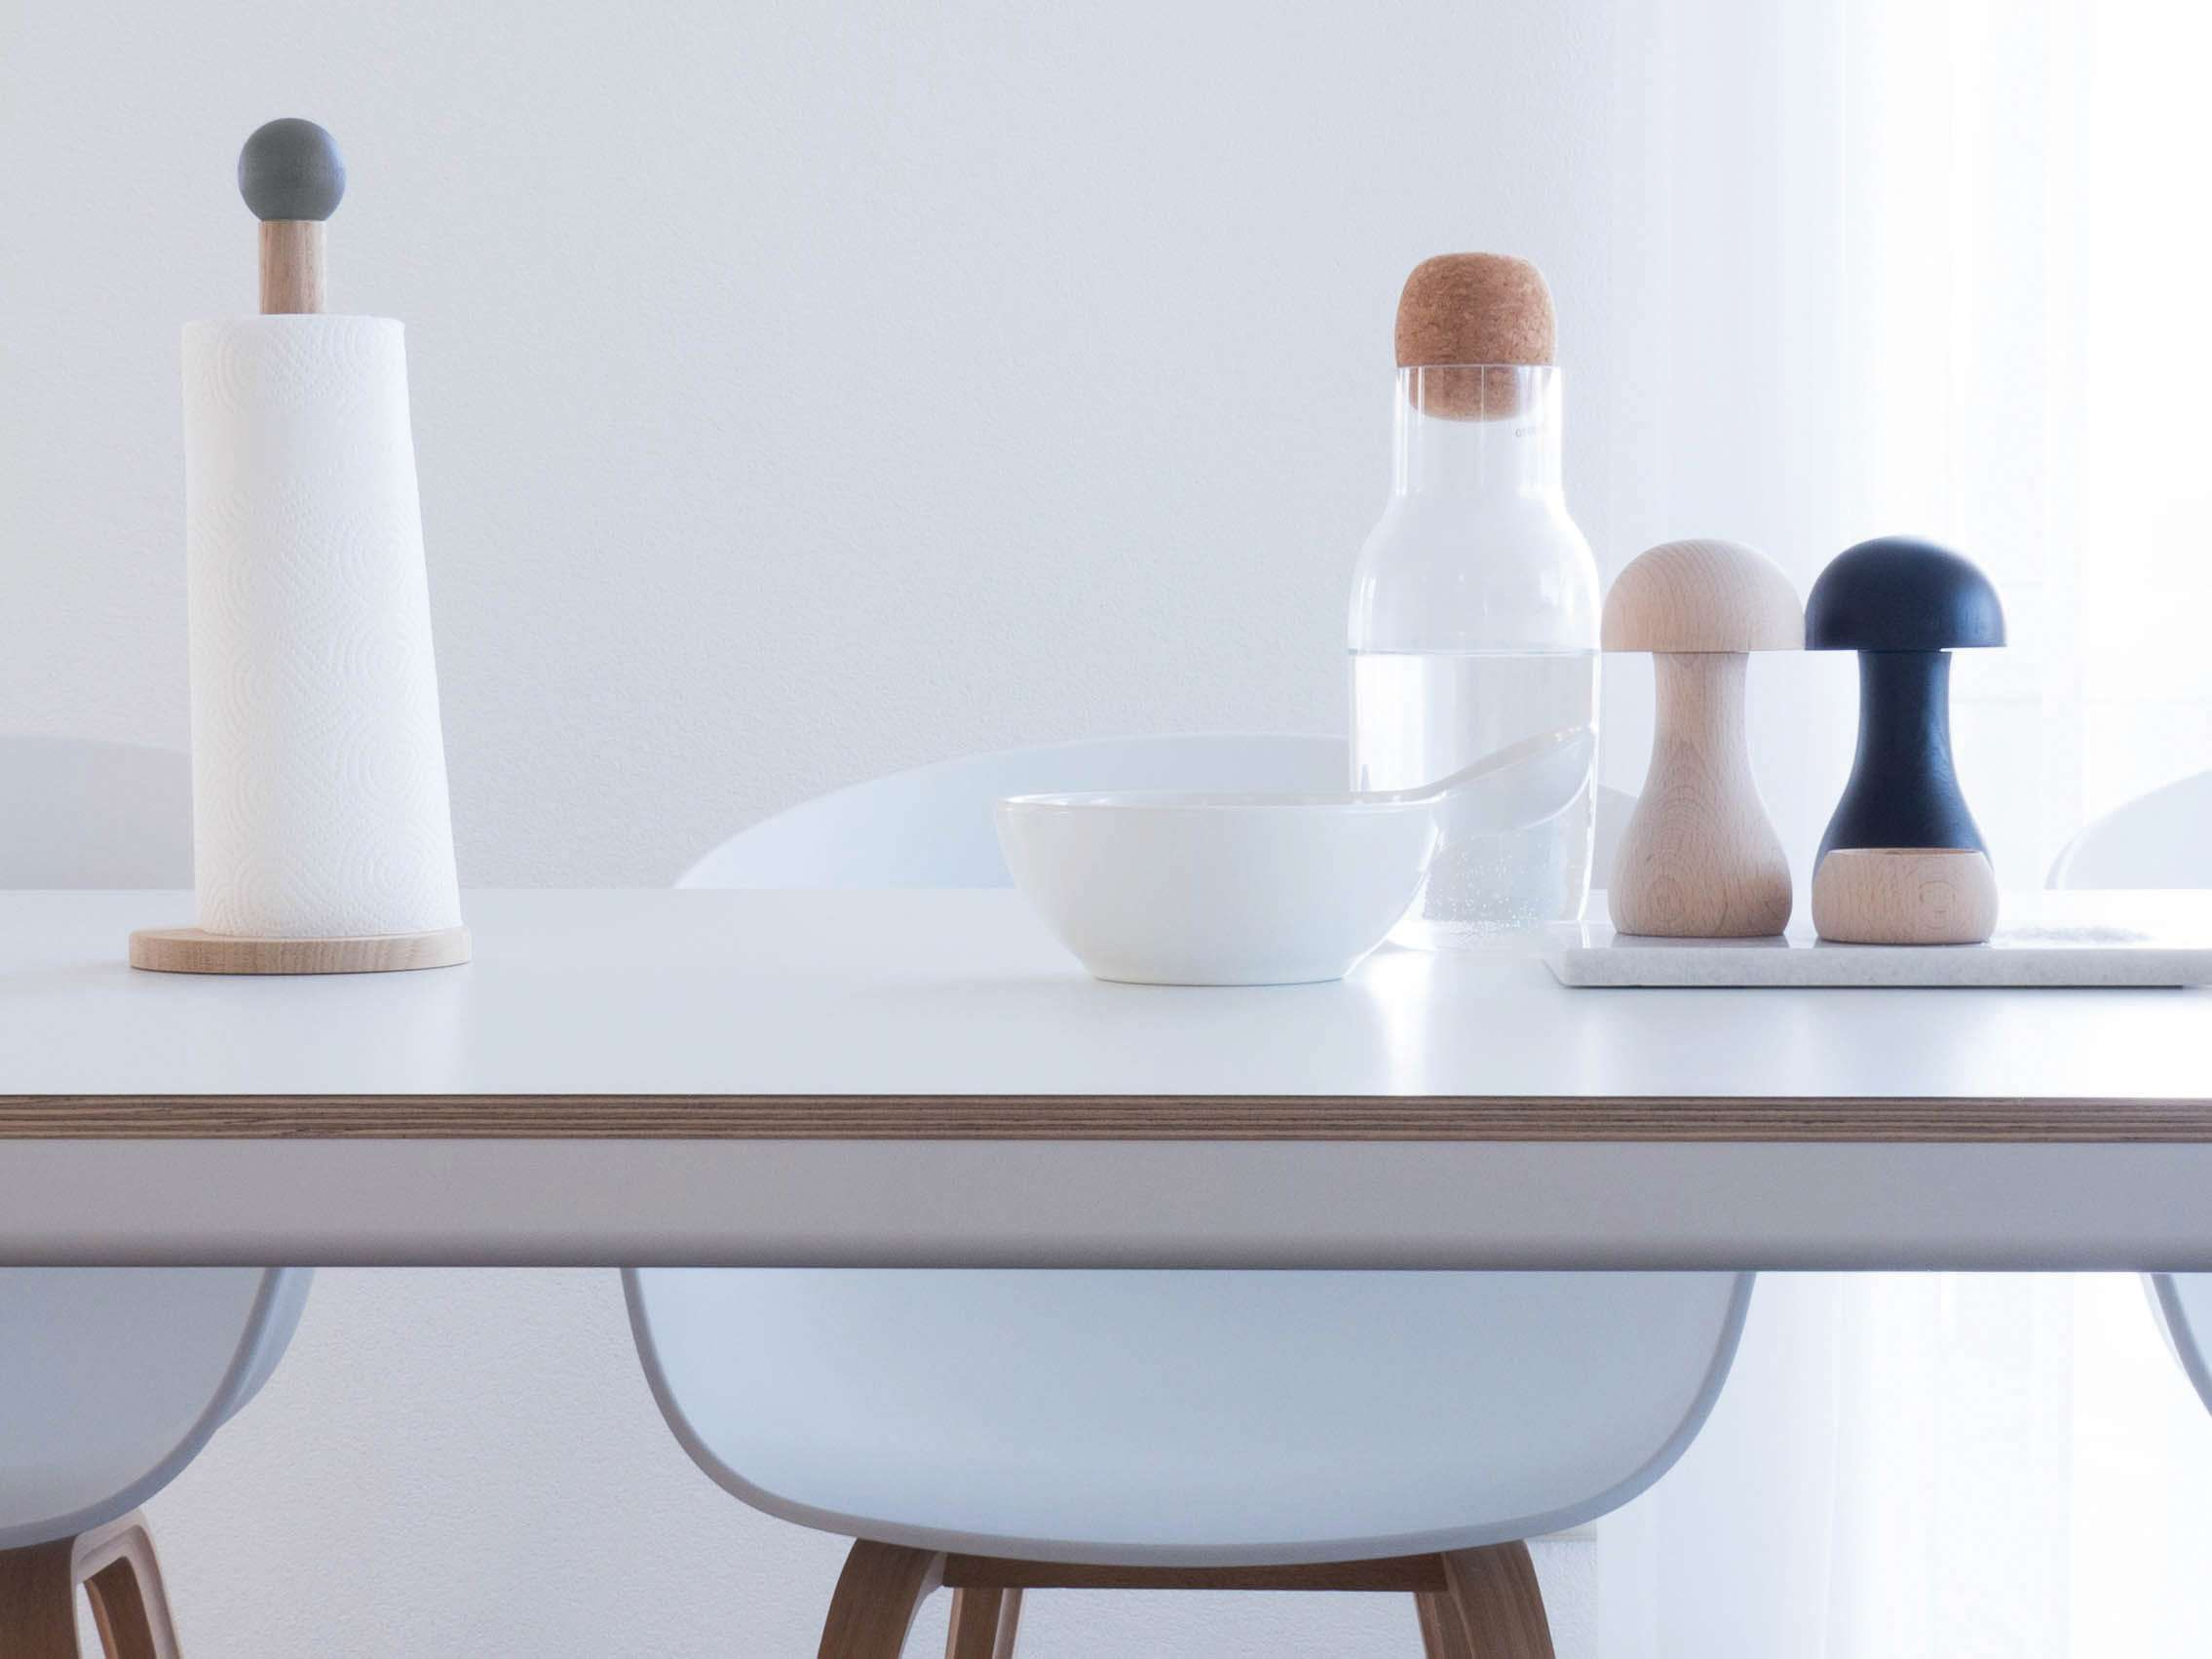 k chenrollenhalter clown von applicata holzdesignpur. Black Bedroom Furniture Sets. Home Design Ideas